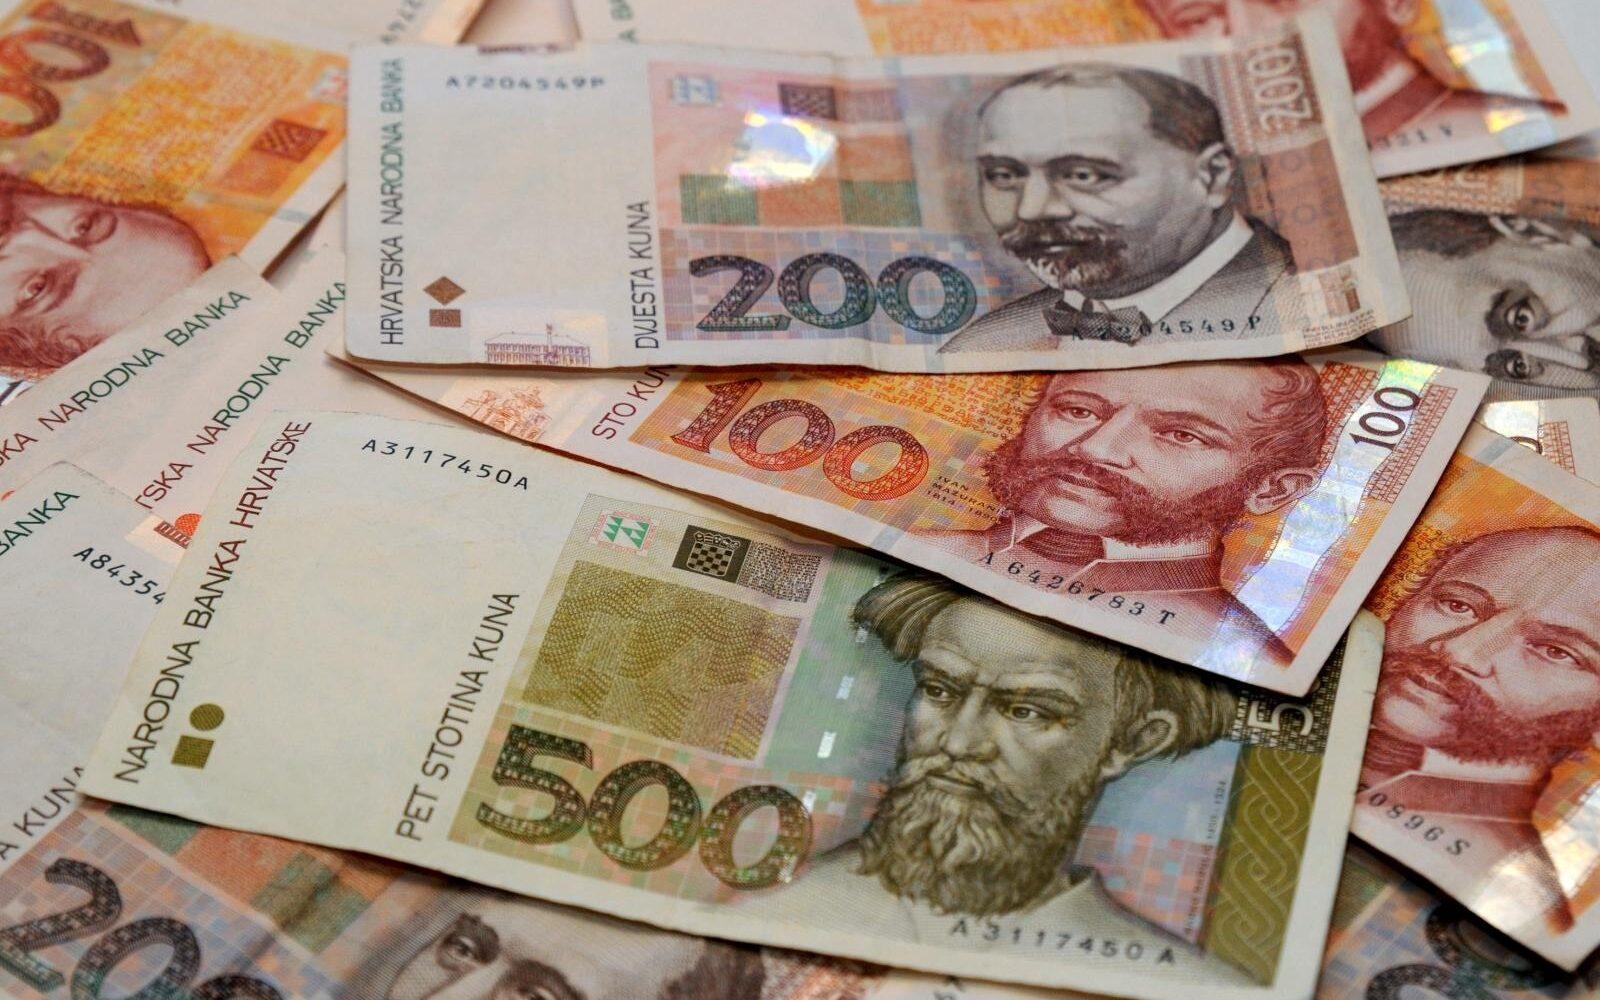 Novac - Ovog tjedna zapošljavaju Blitz, Trenkwalder, MB